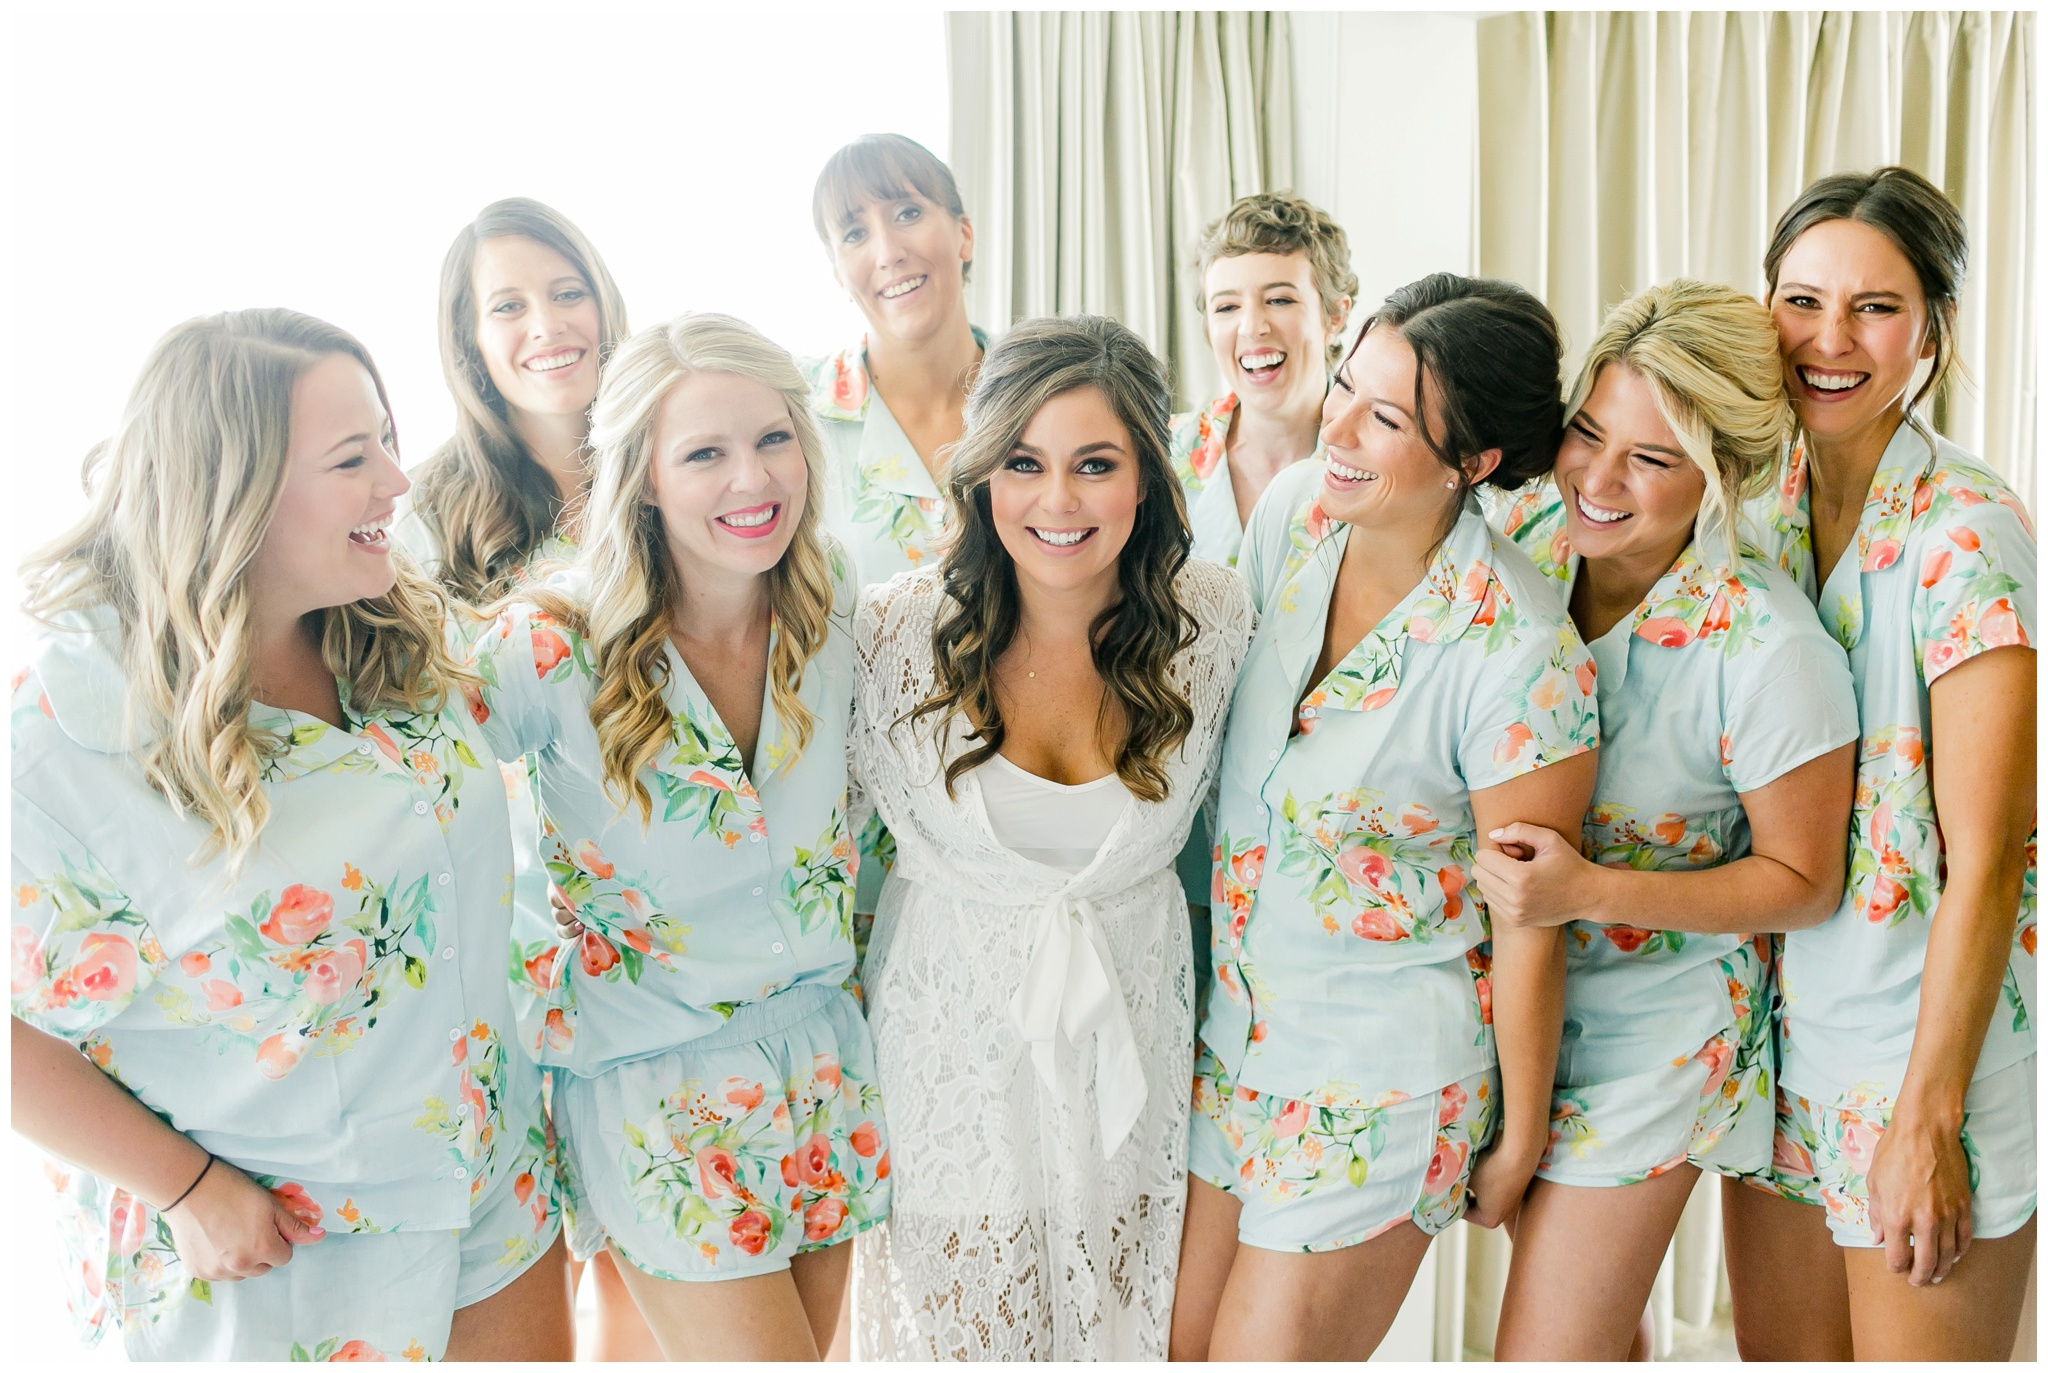 UW_Memorial_Union_wedding_madison_wisconsin_wedding_photographers_4583.jpg